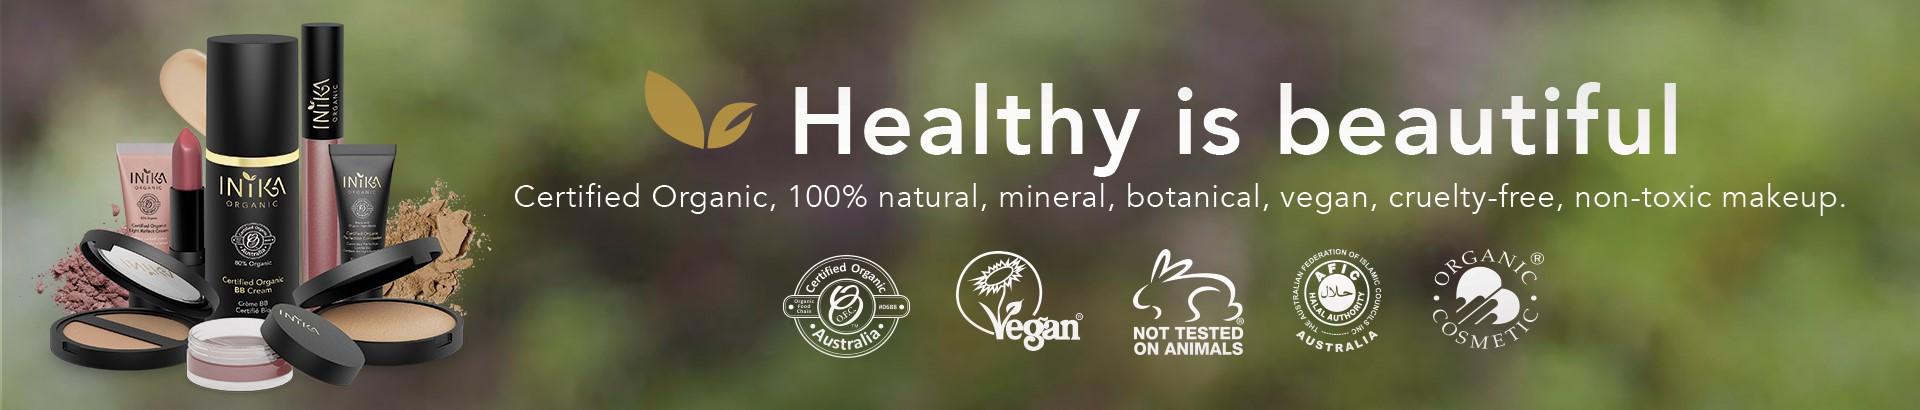 Buy Inika Organic from Naturally Safe Cosmetics